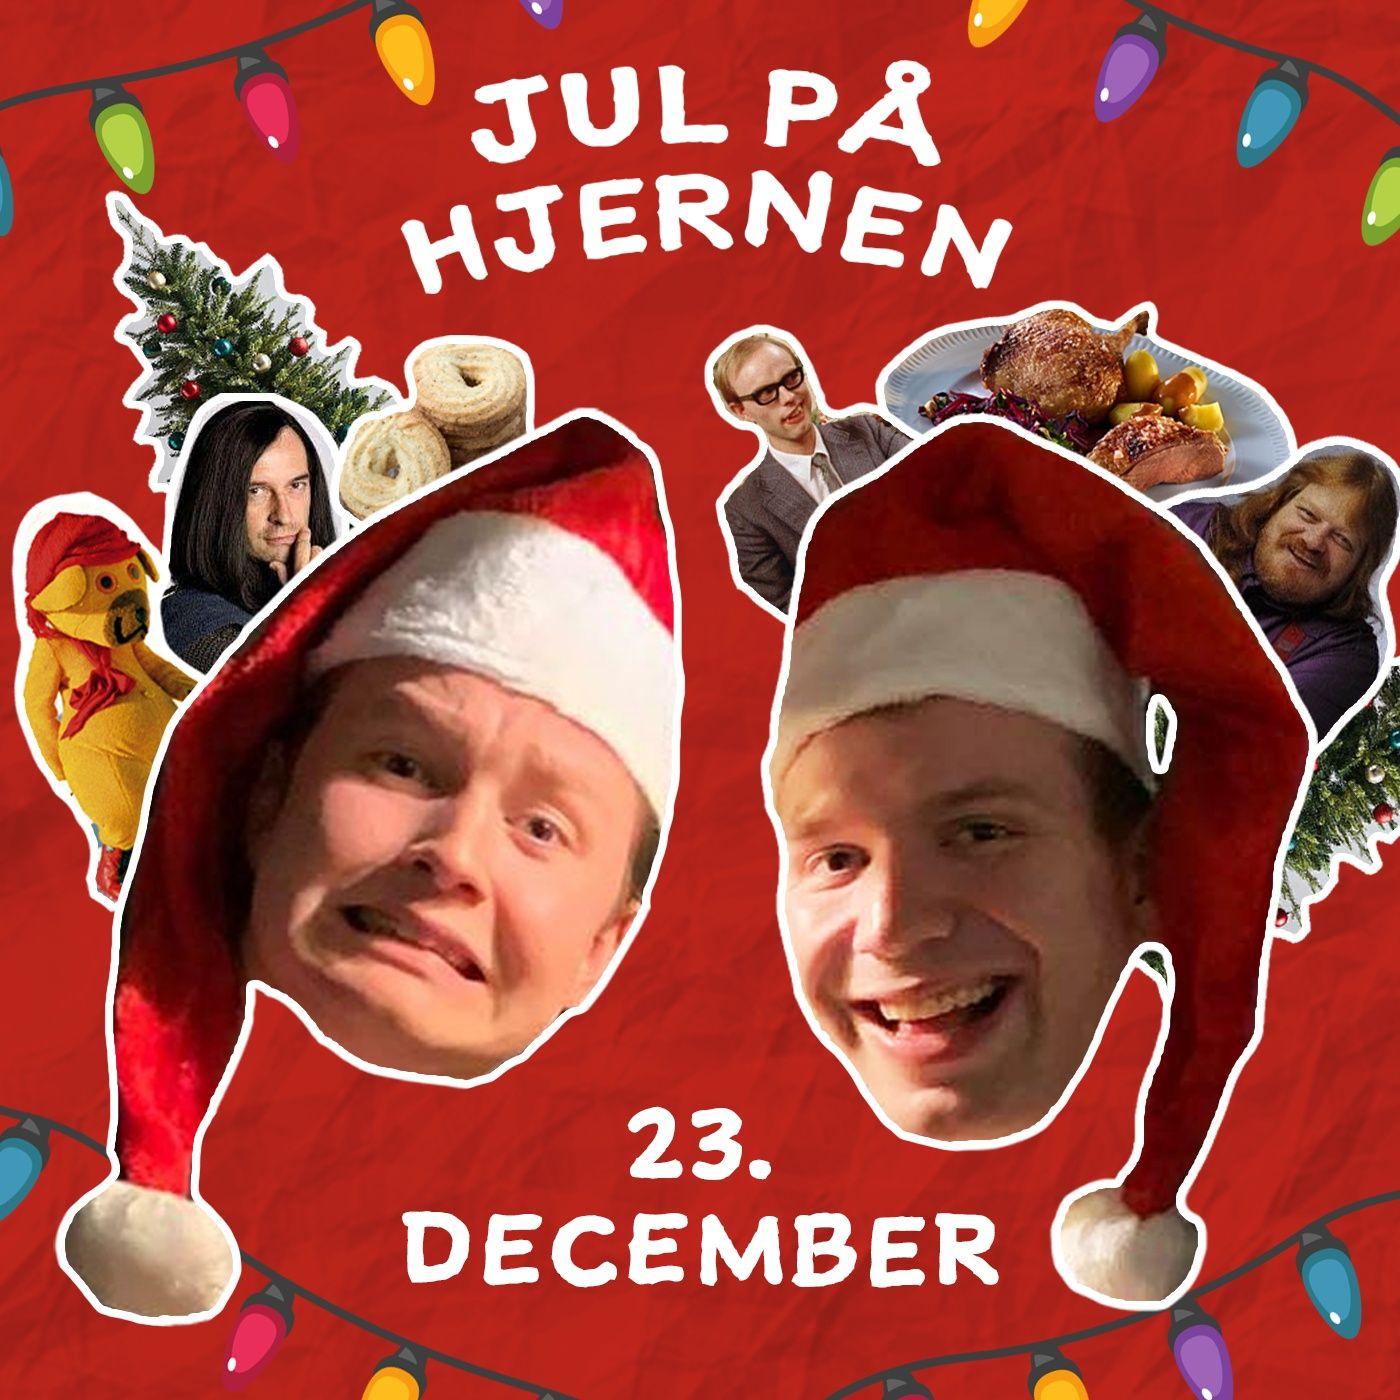 23 december - Jul på hjernen